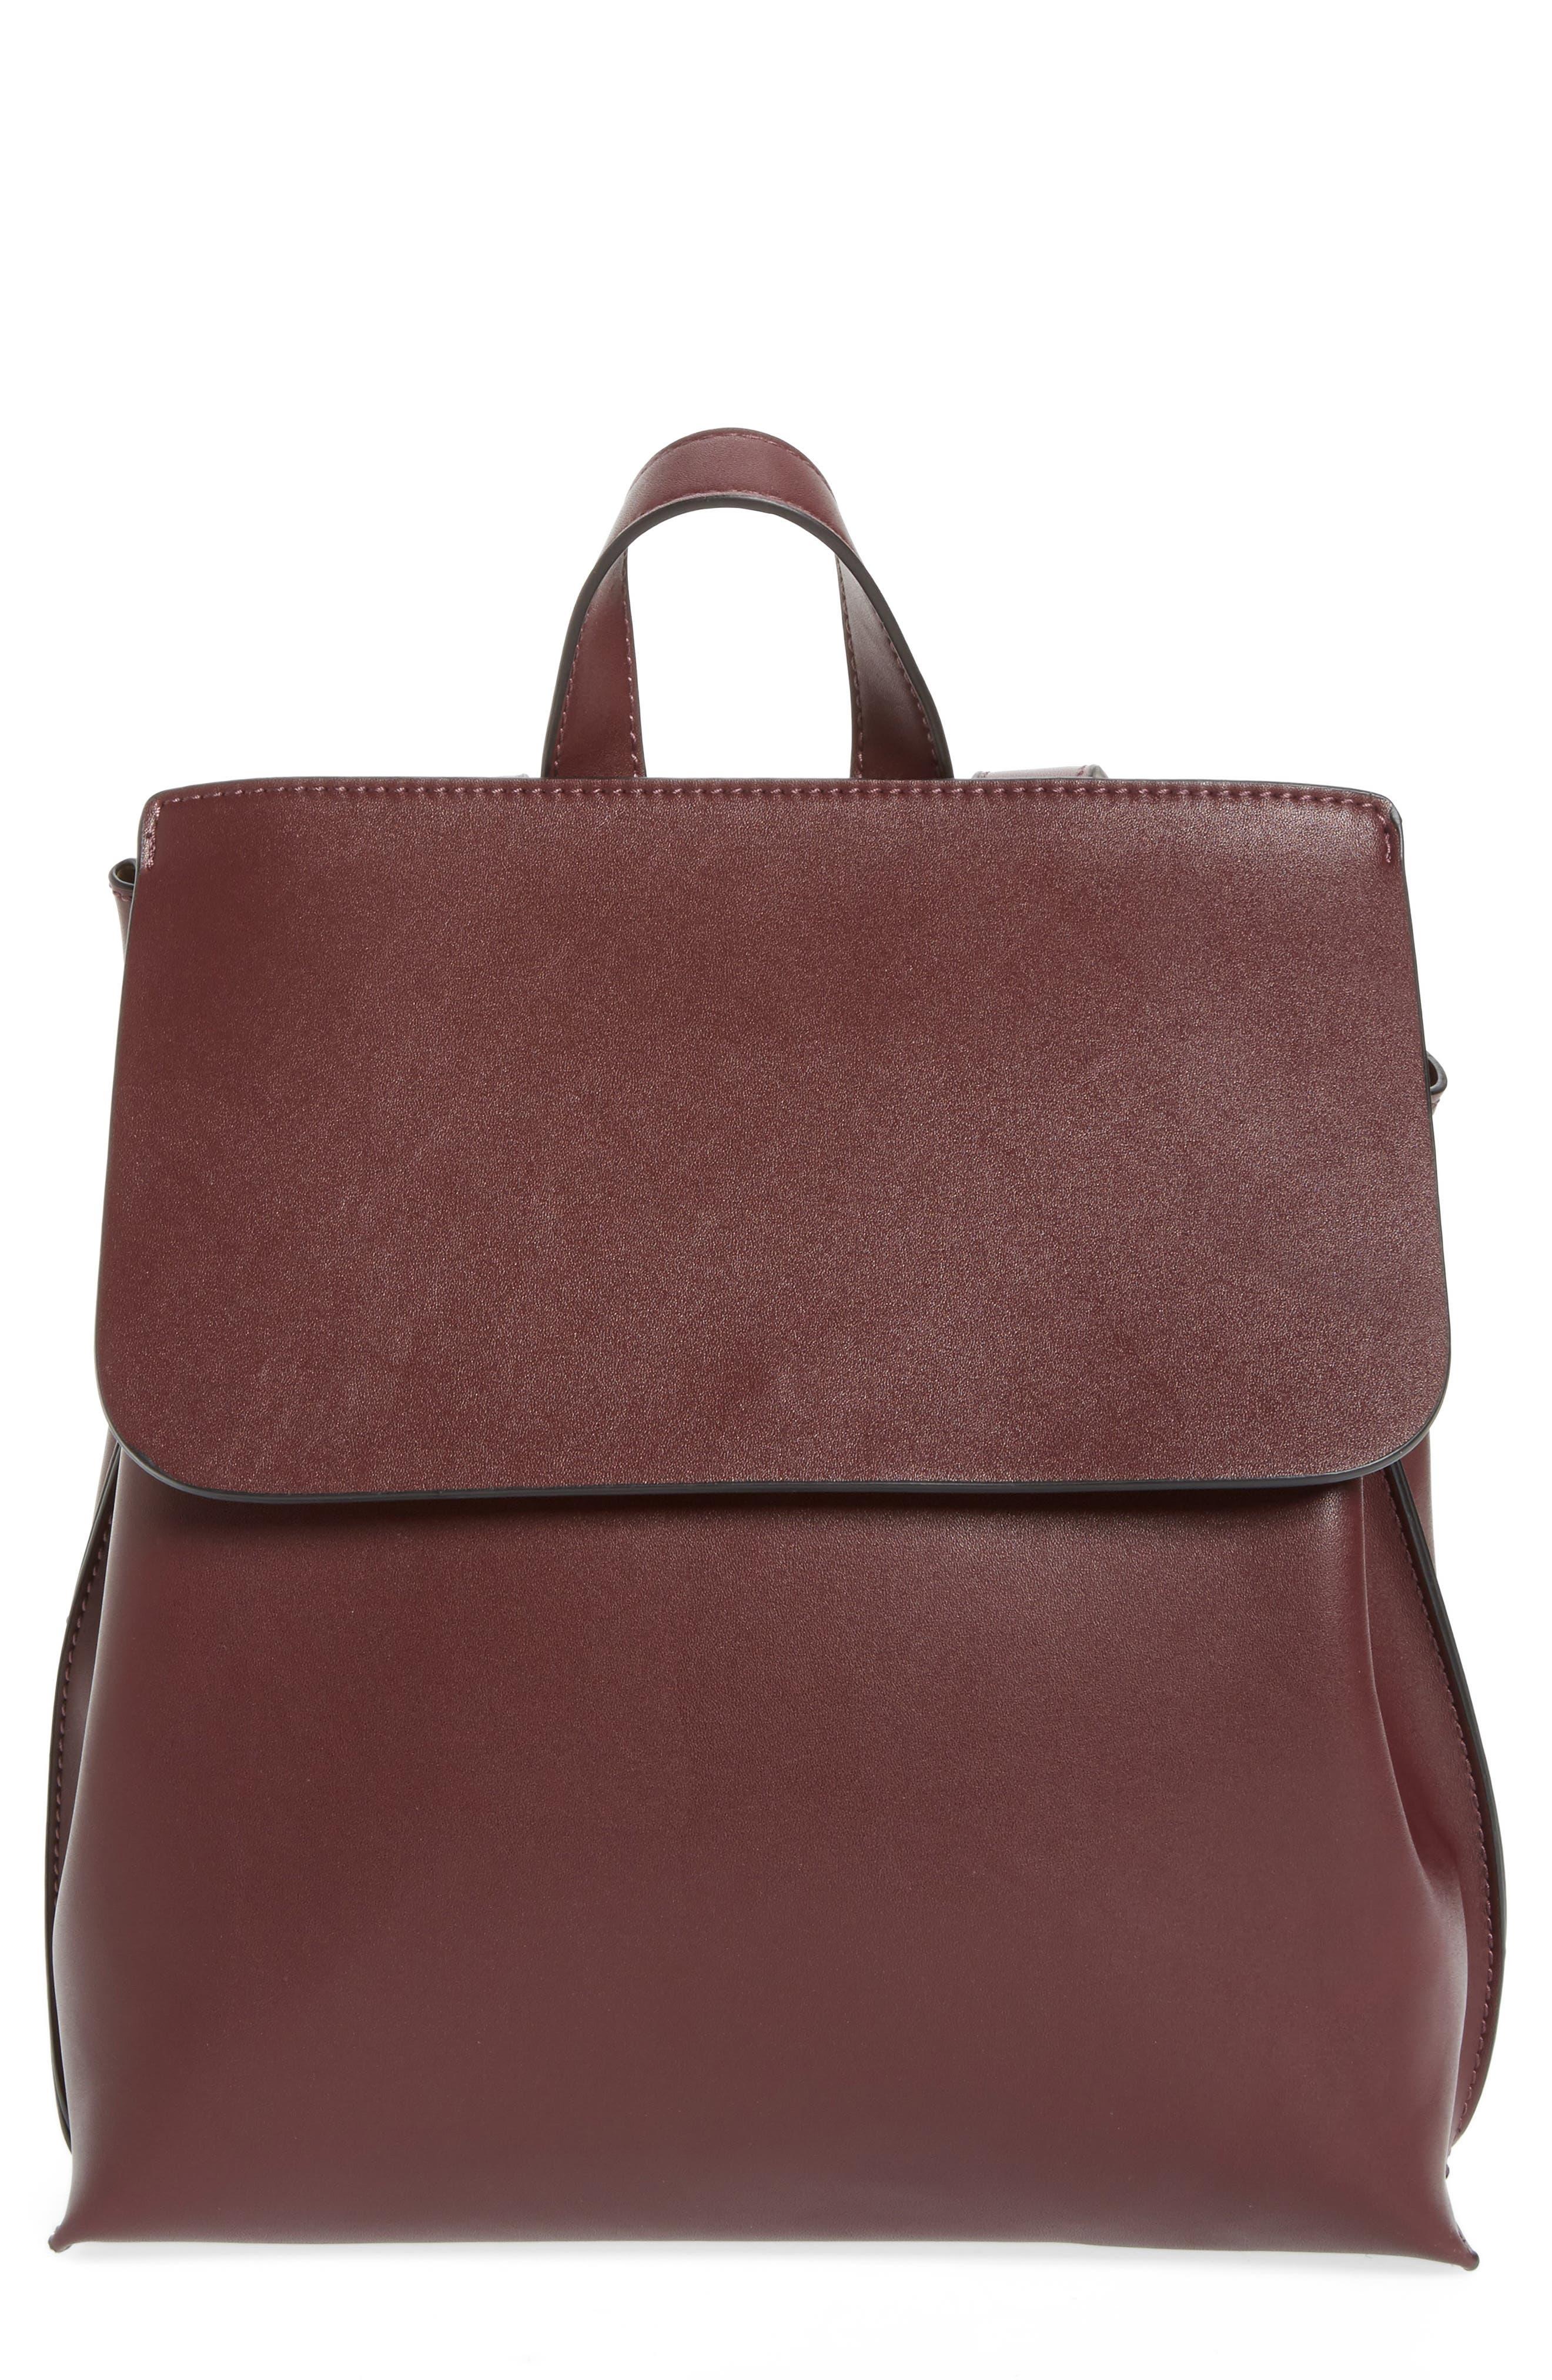 Selena Faux Leather Backpack,                             Alternate thumbnail 8, color,